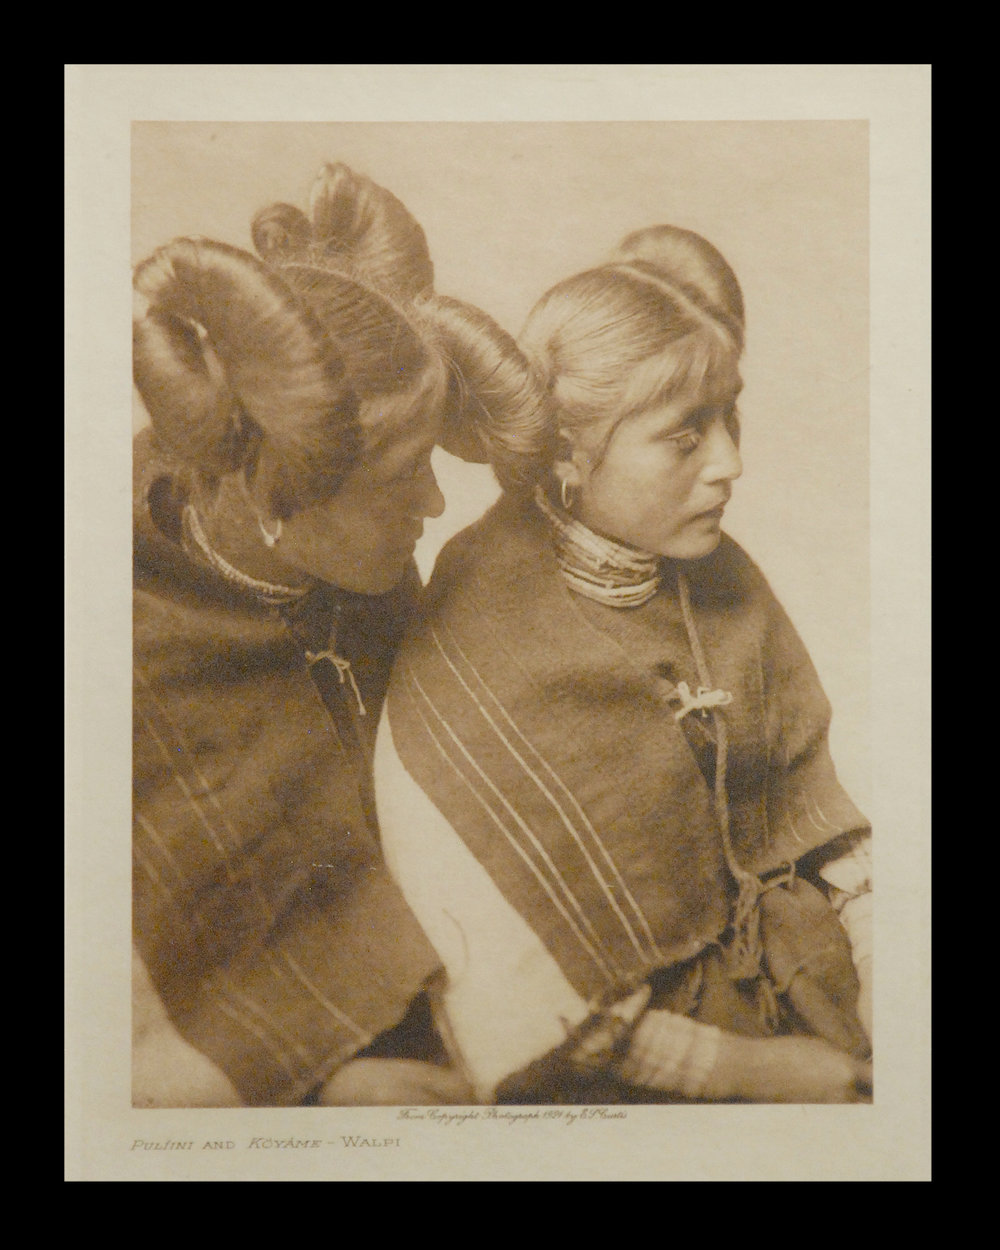 """Pulfini and Koyame - Walpi"" 1924 Vol.12     Vellum Print,Vintage Photogravure"